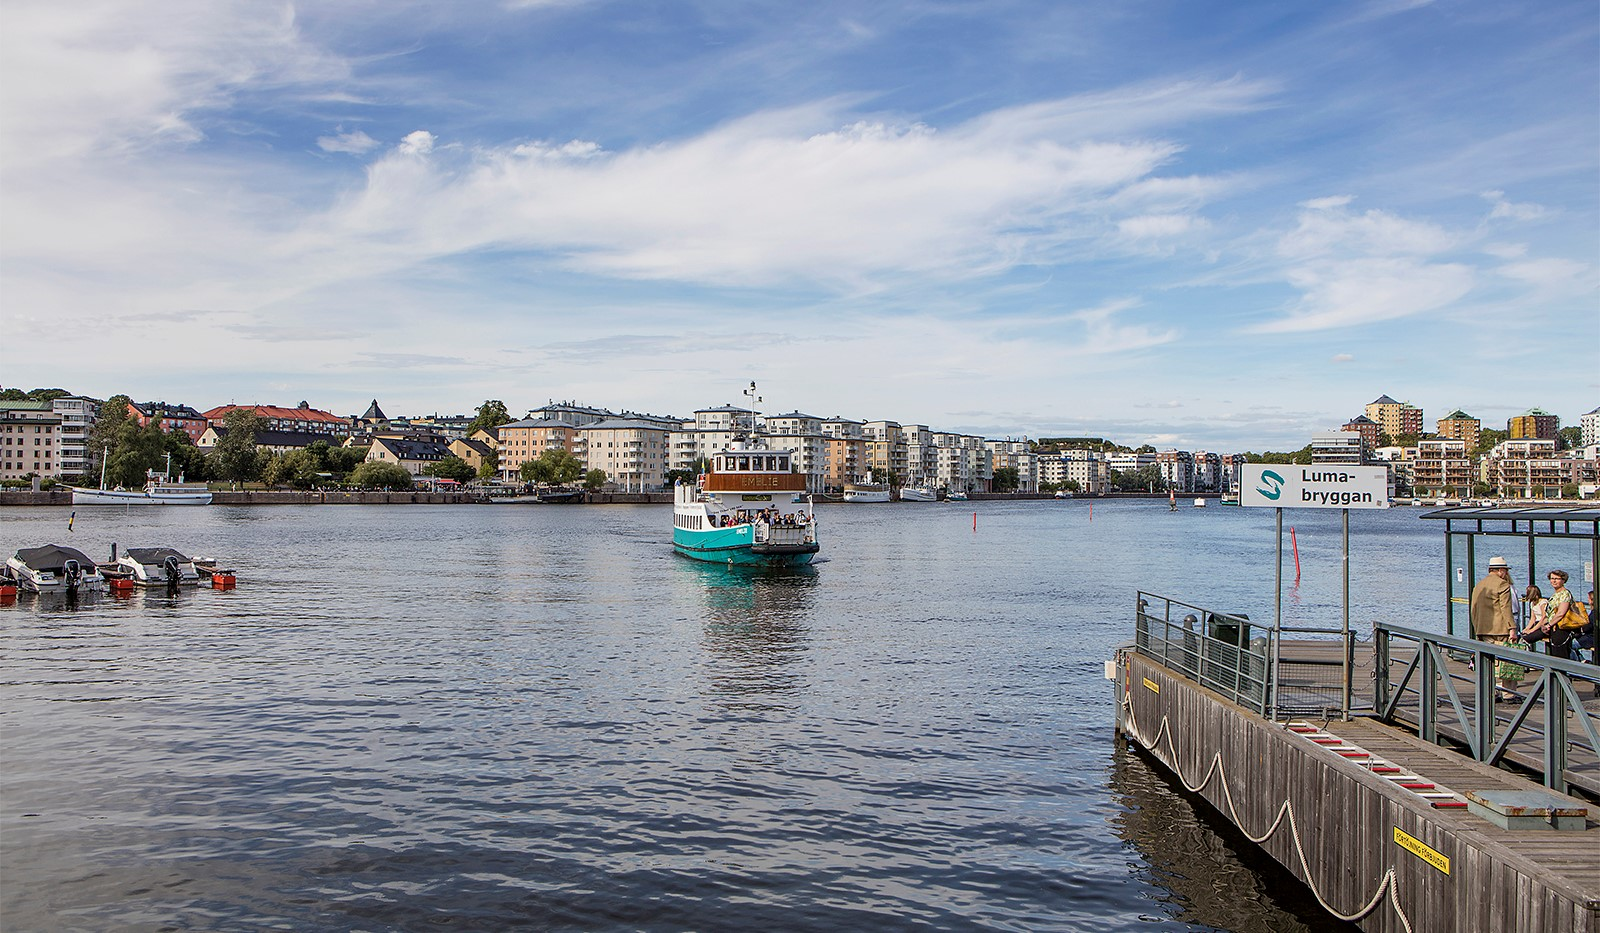 Heliosgatan 58 - Ta båten till stan!